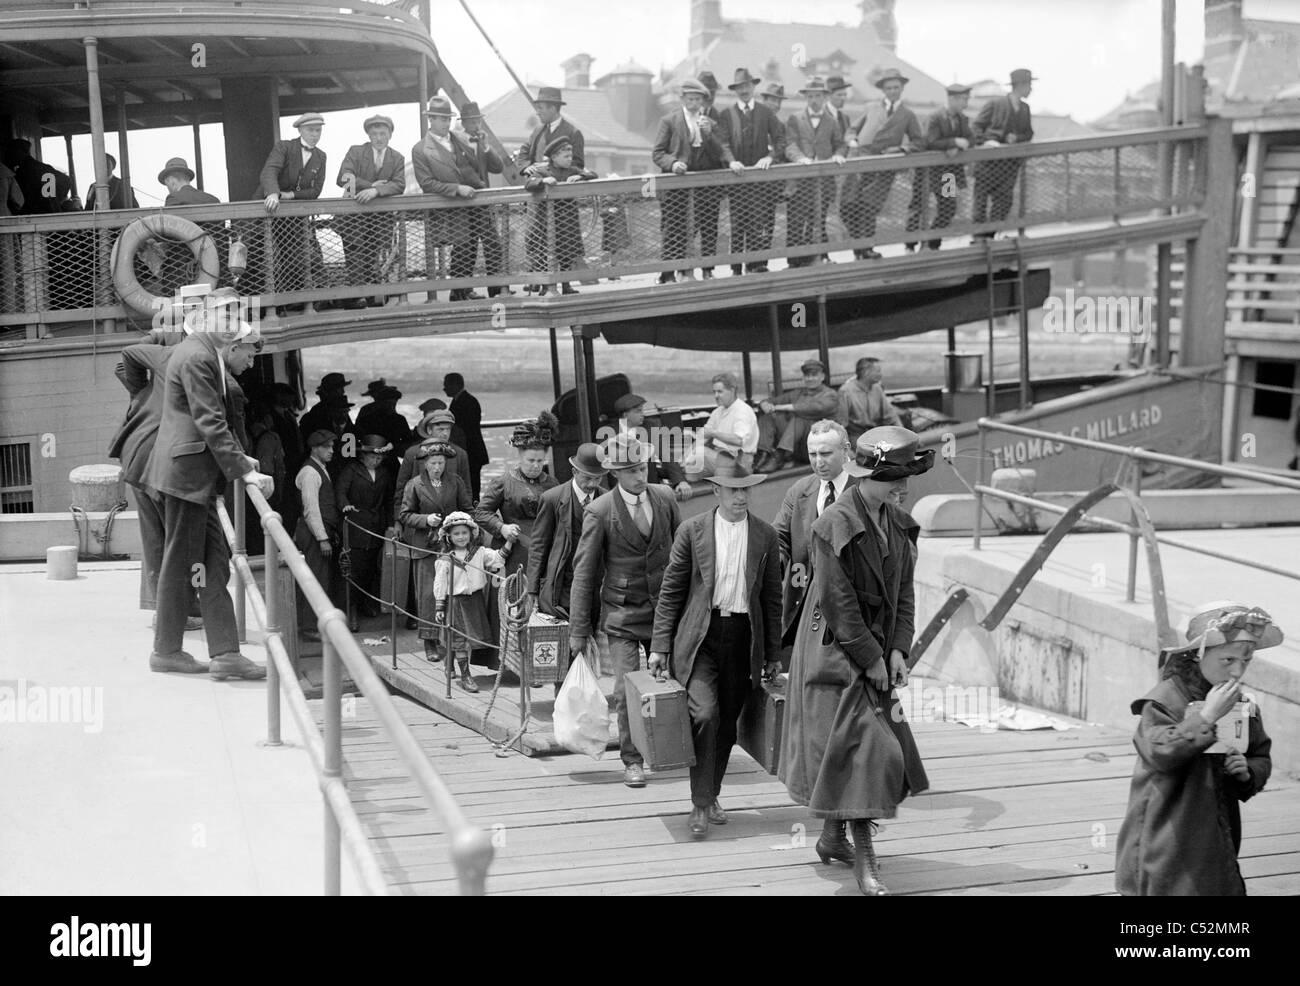 New York Ellis Island Immigrats